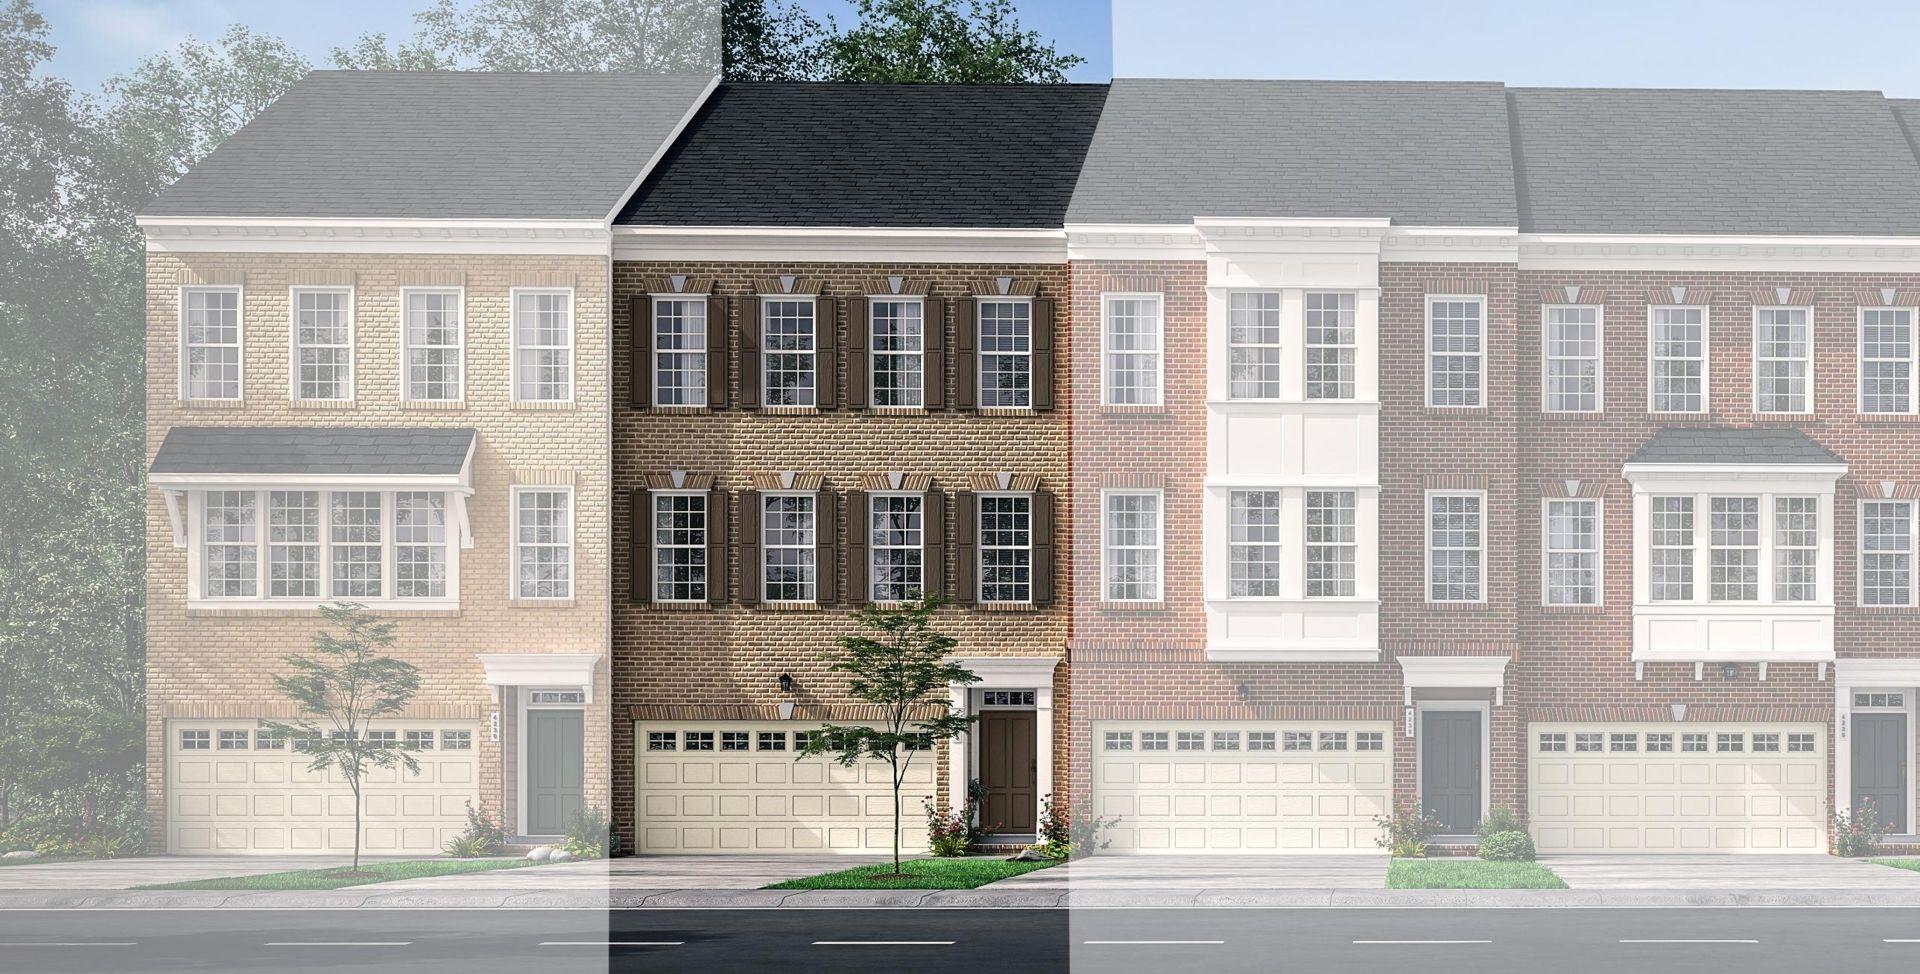 New Construction Homes & Plans in Upper Marlboro, MD | 2,289